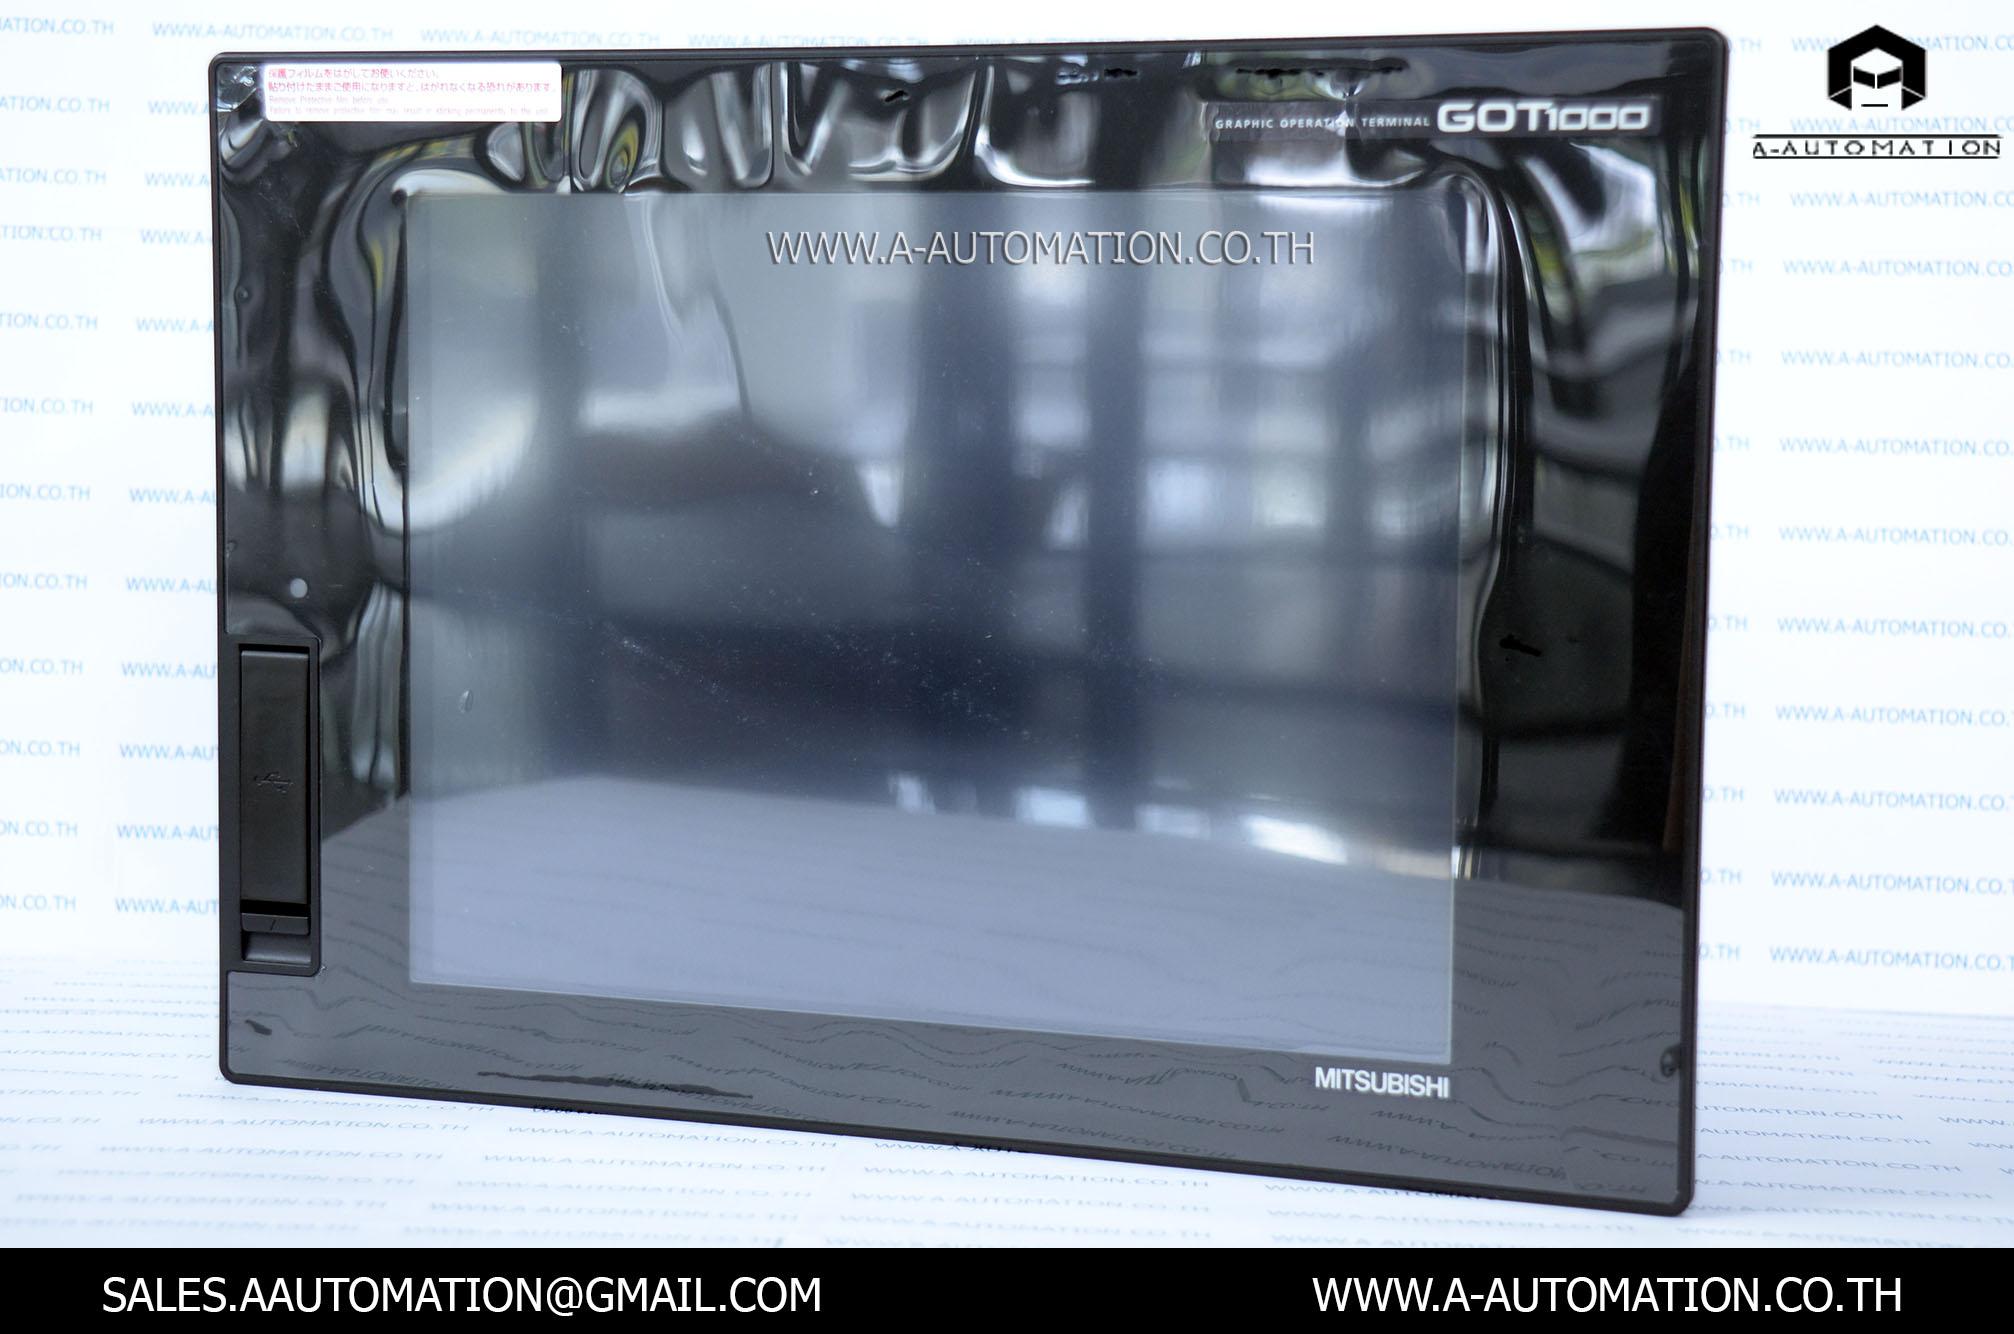 TOUCH SCREEN MODEL:GT1675M-STBA,65536 สี 10.4 นิ้ว [MITSUBISHI]